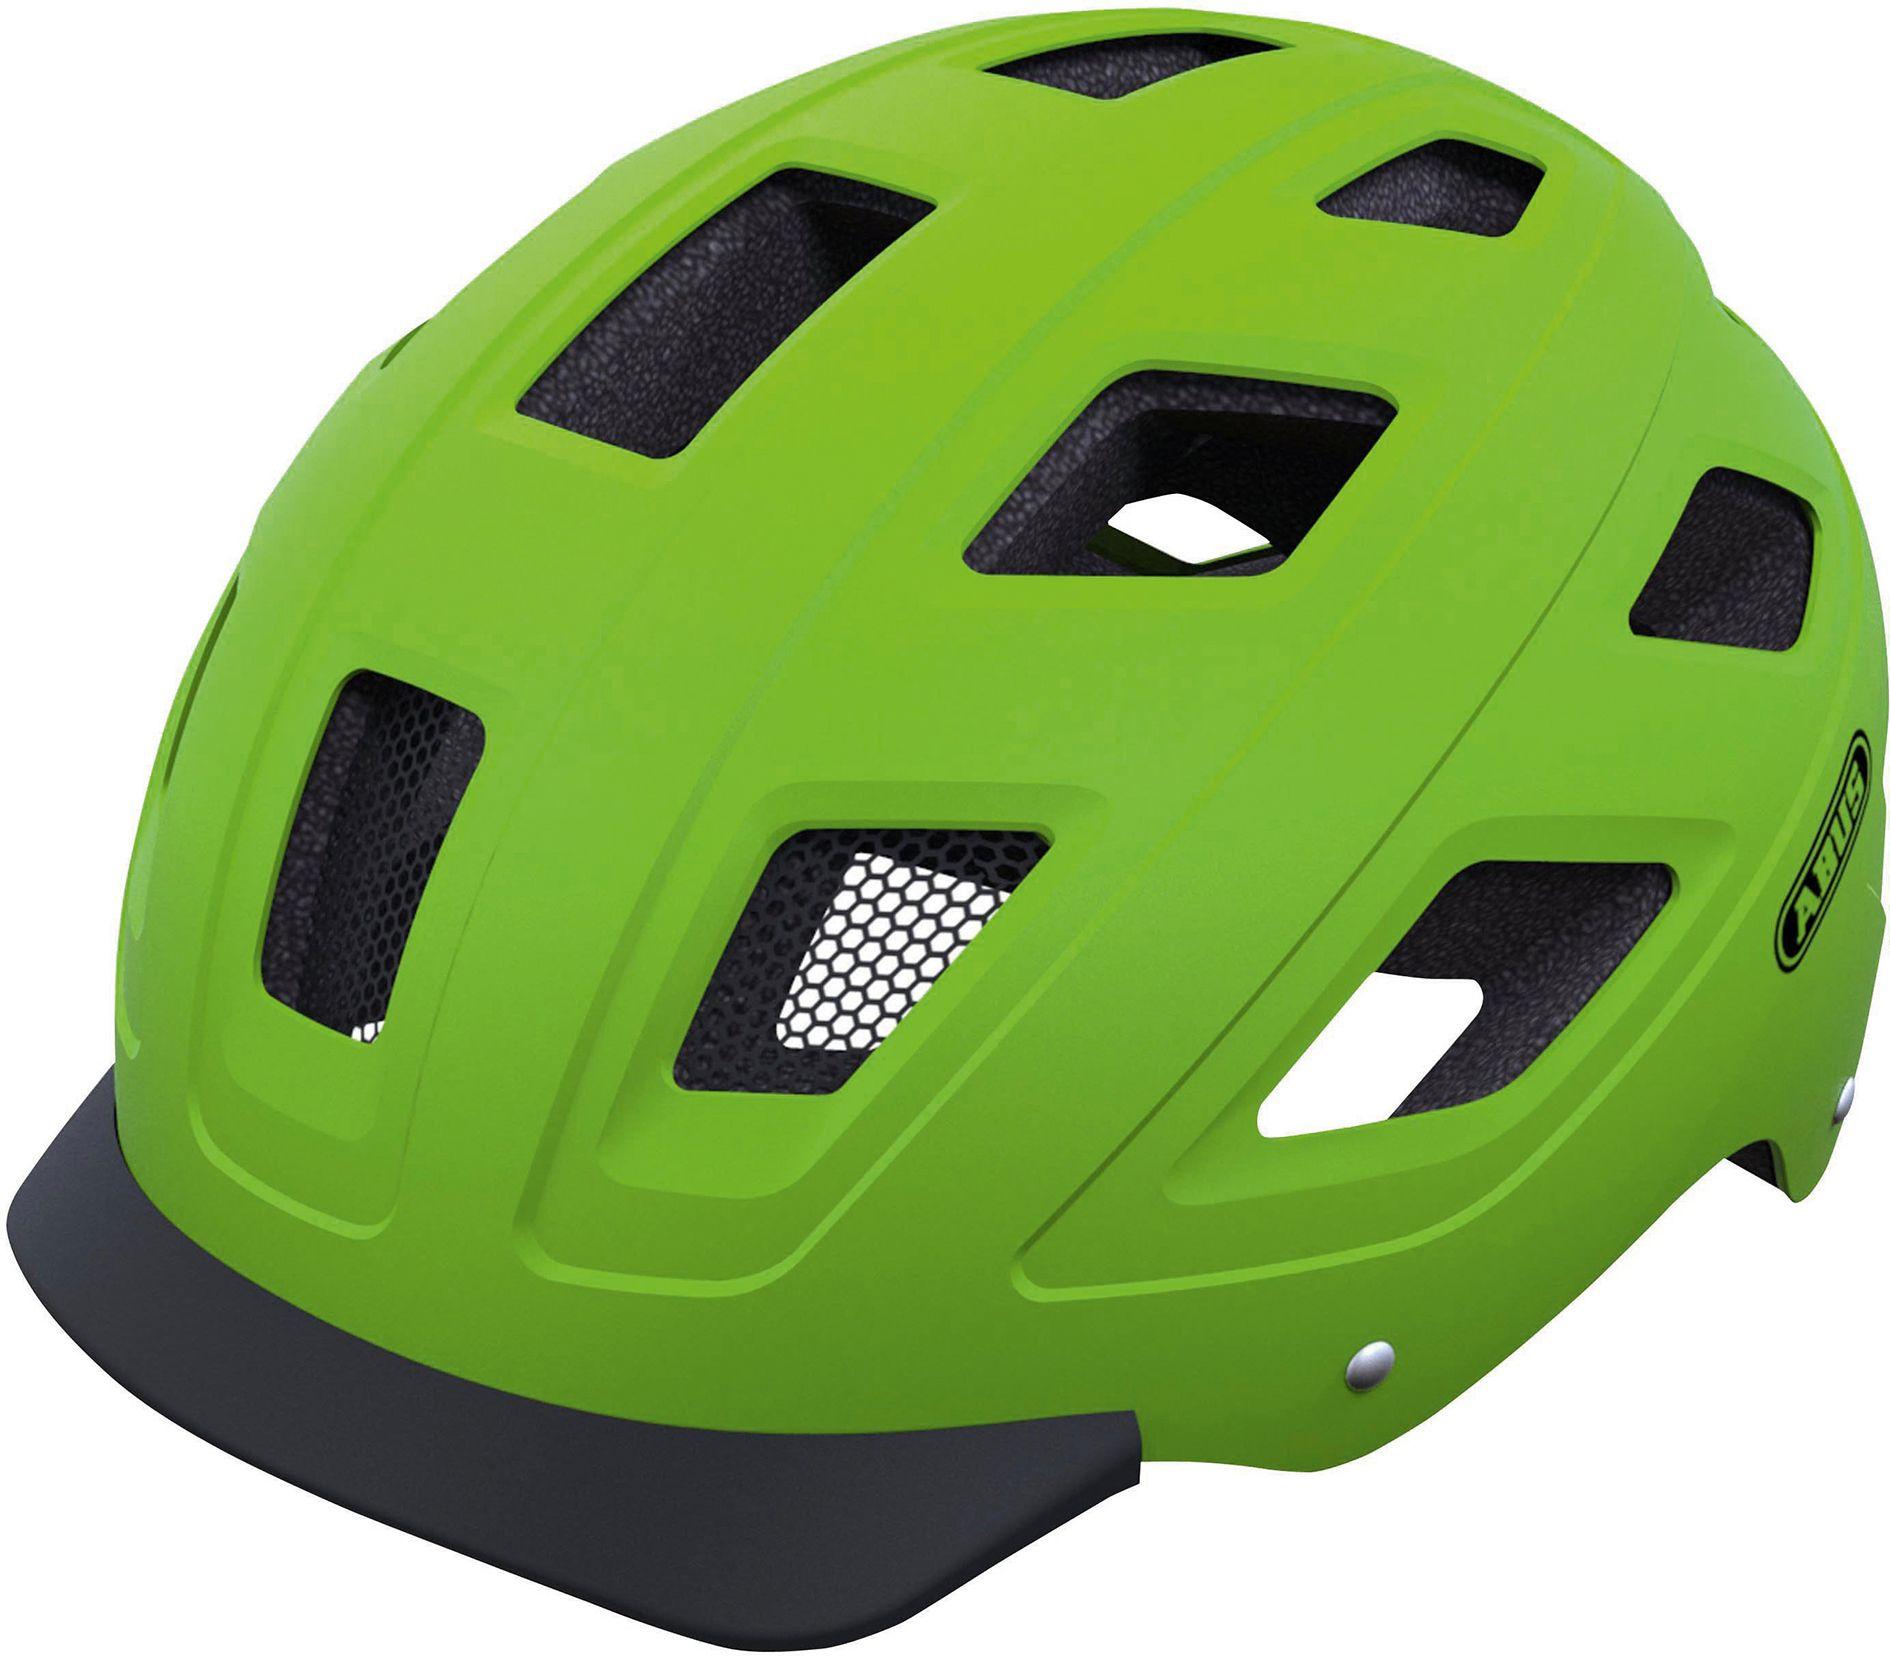 Hyban Green ABUS ciclismo cascos cascosurbanos bicis